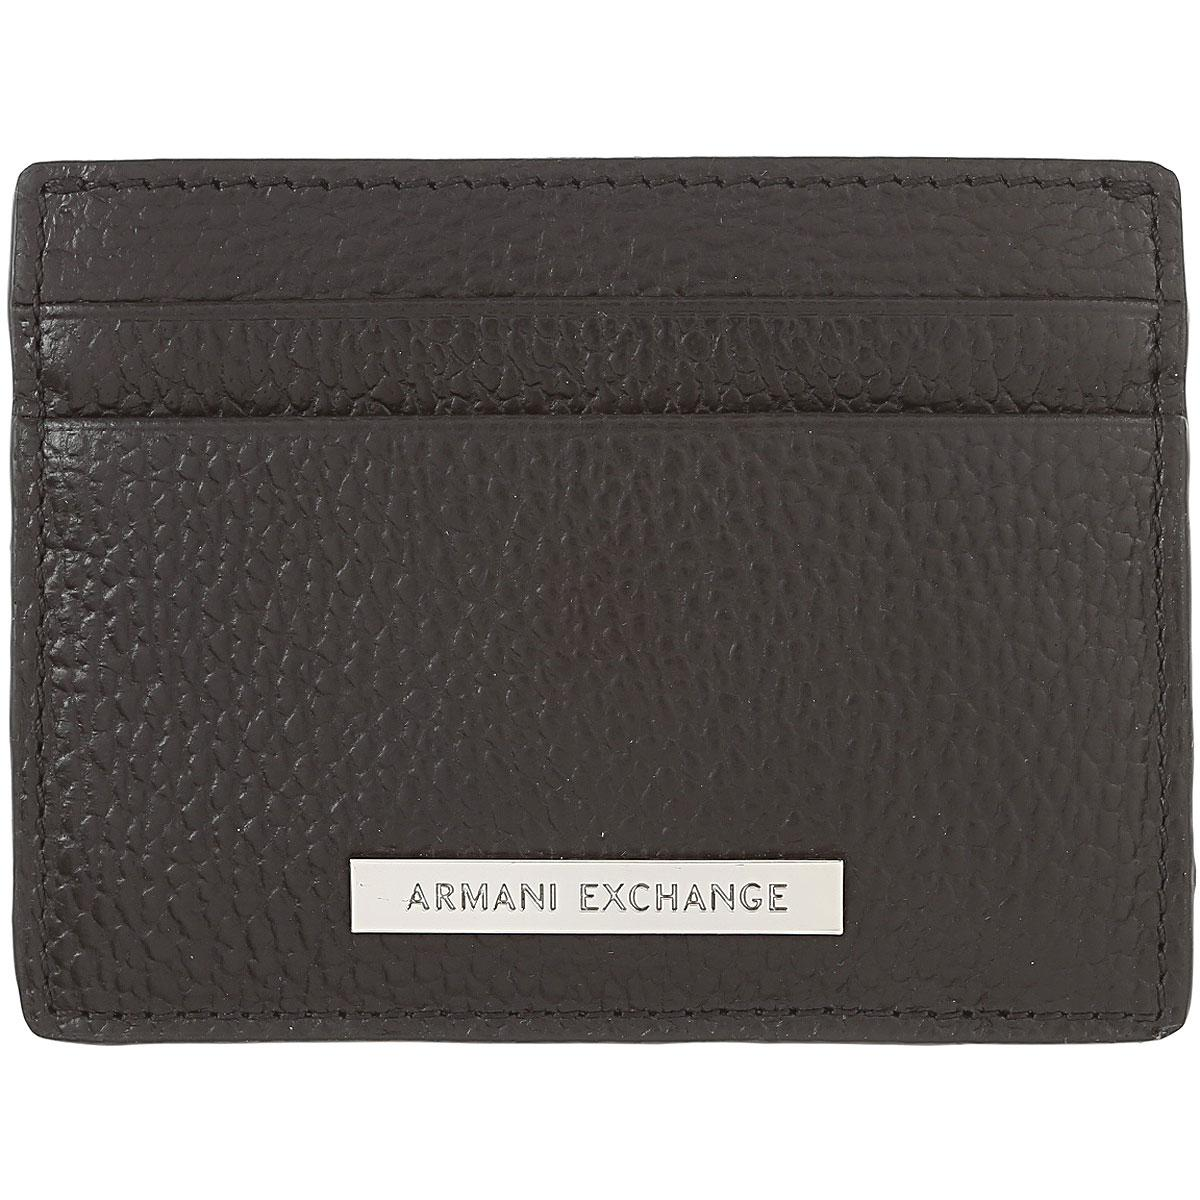 7ffe974cd72 Lyst - Armani Jeans Wallets   Accessories For Men in Black for Men